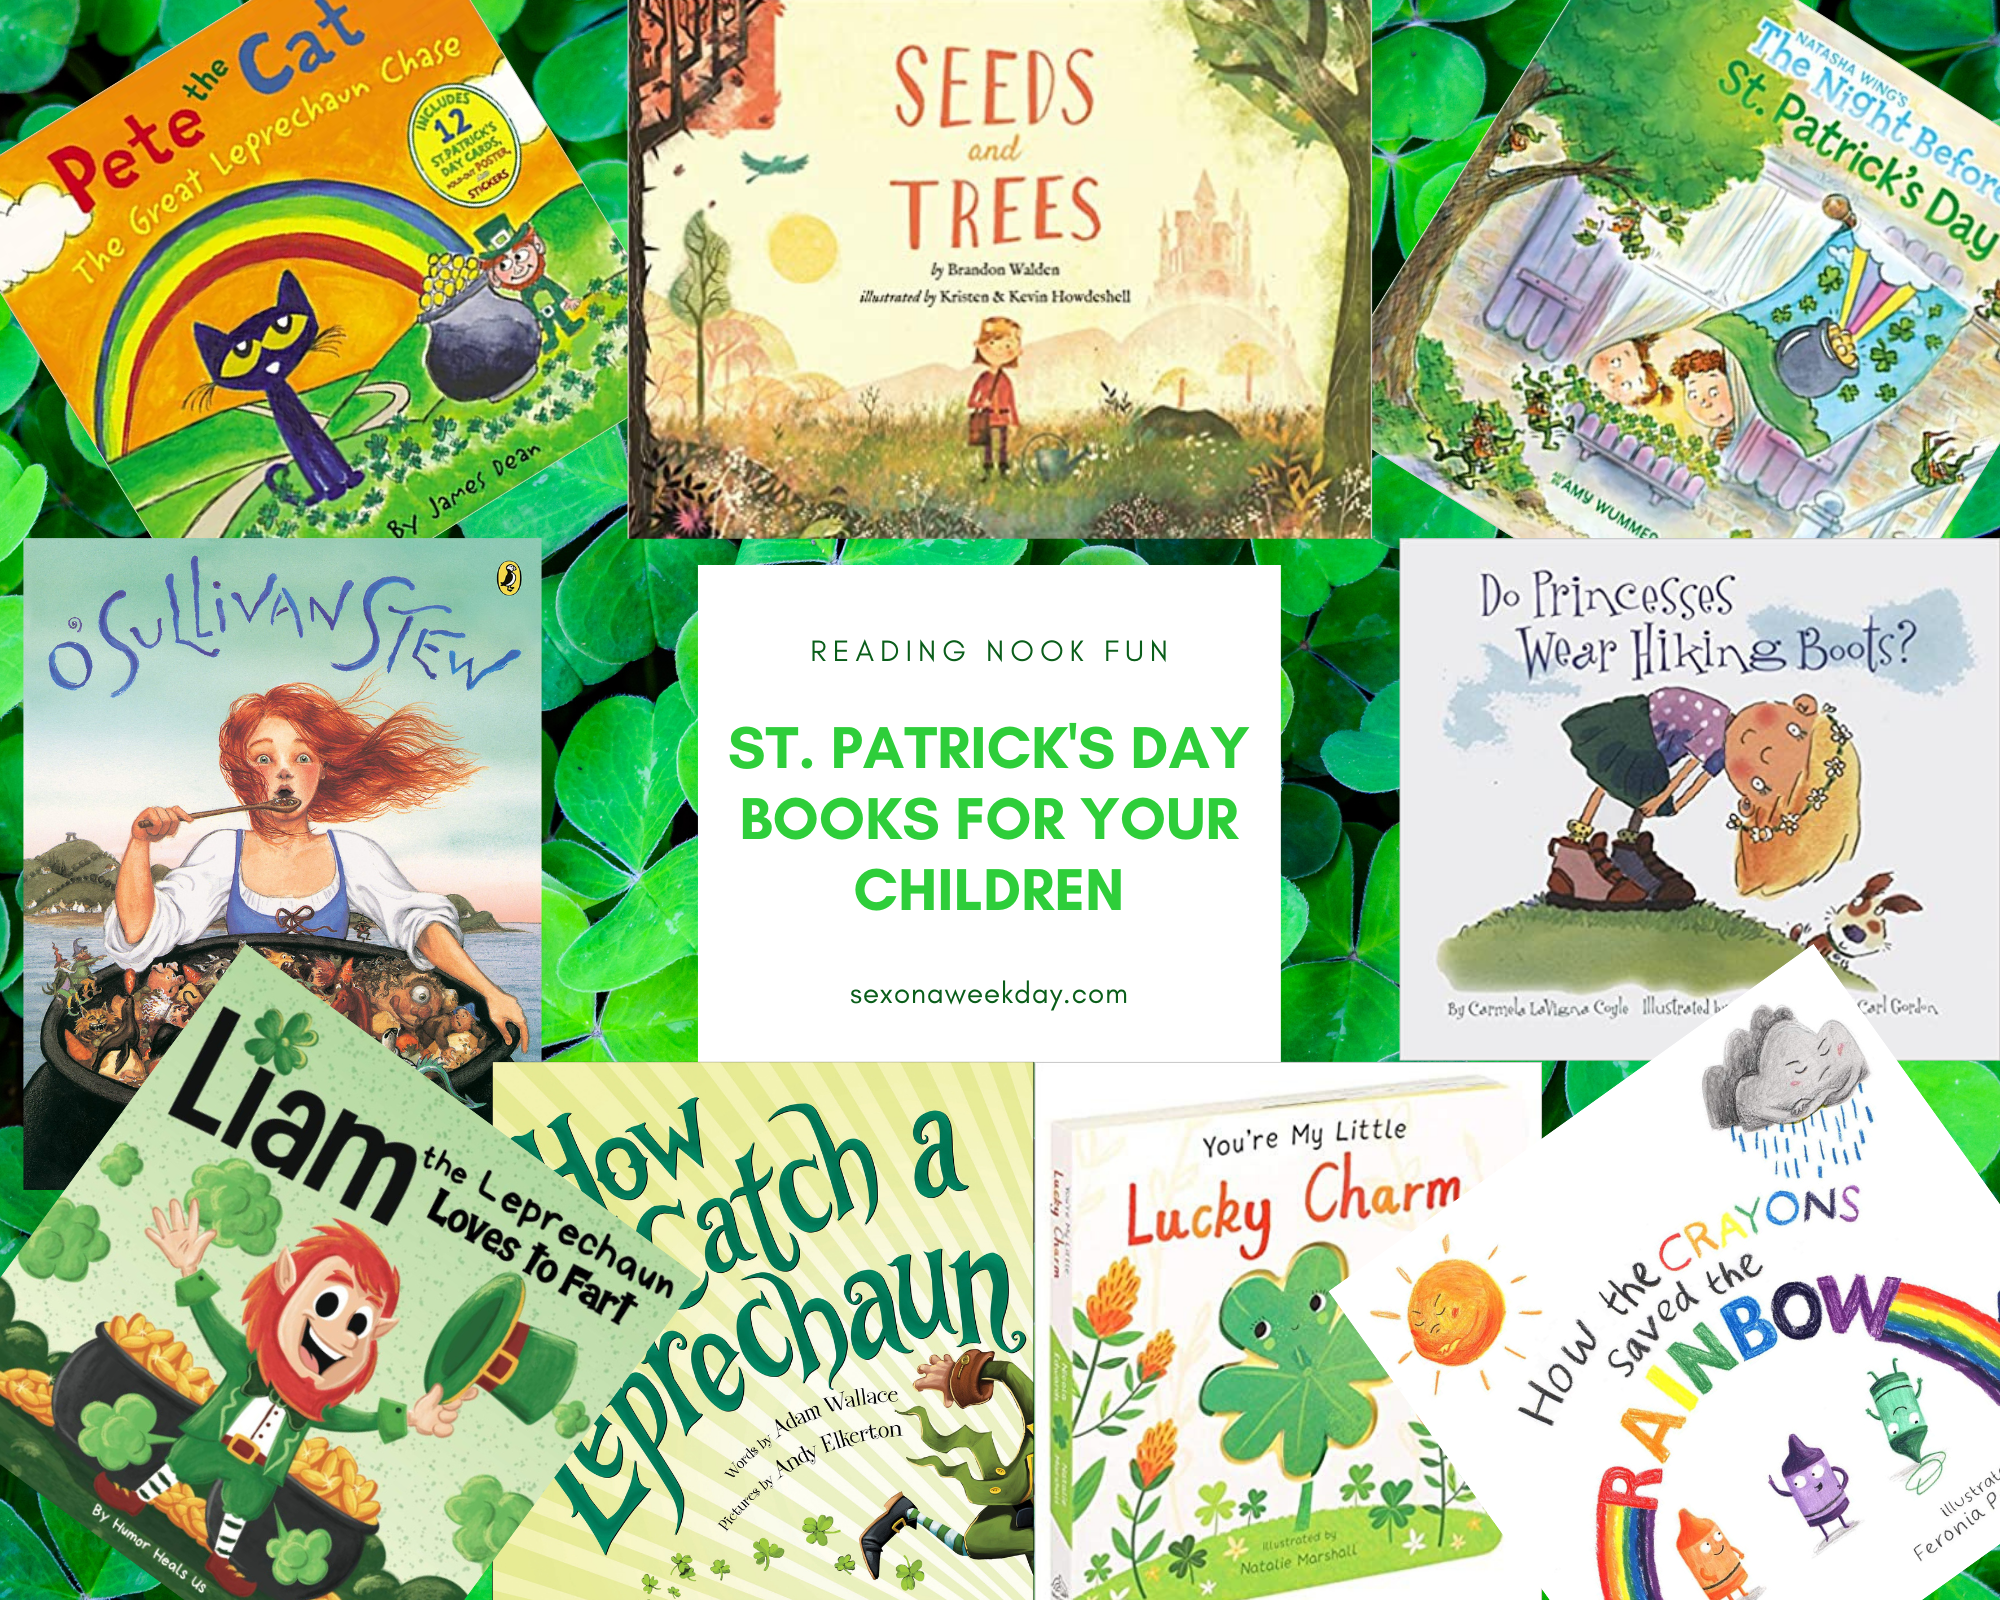 st.-patricks-day-books-for-your-children